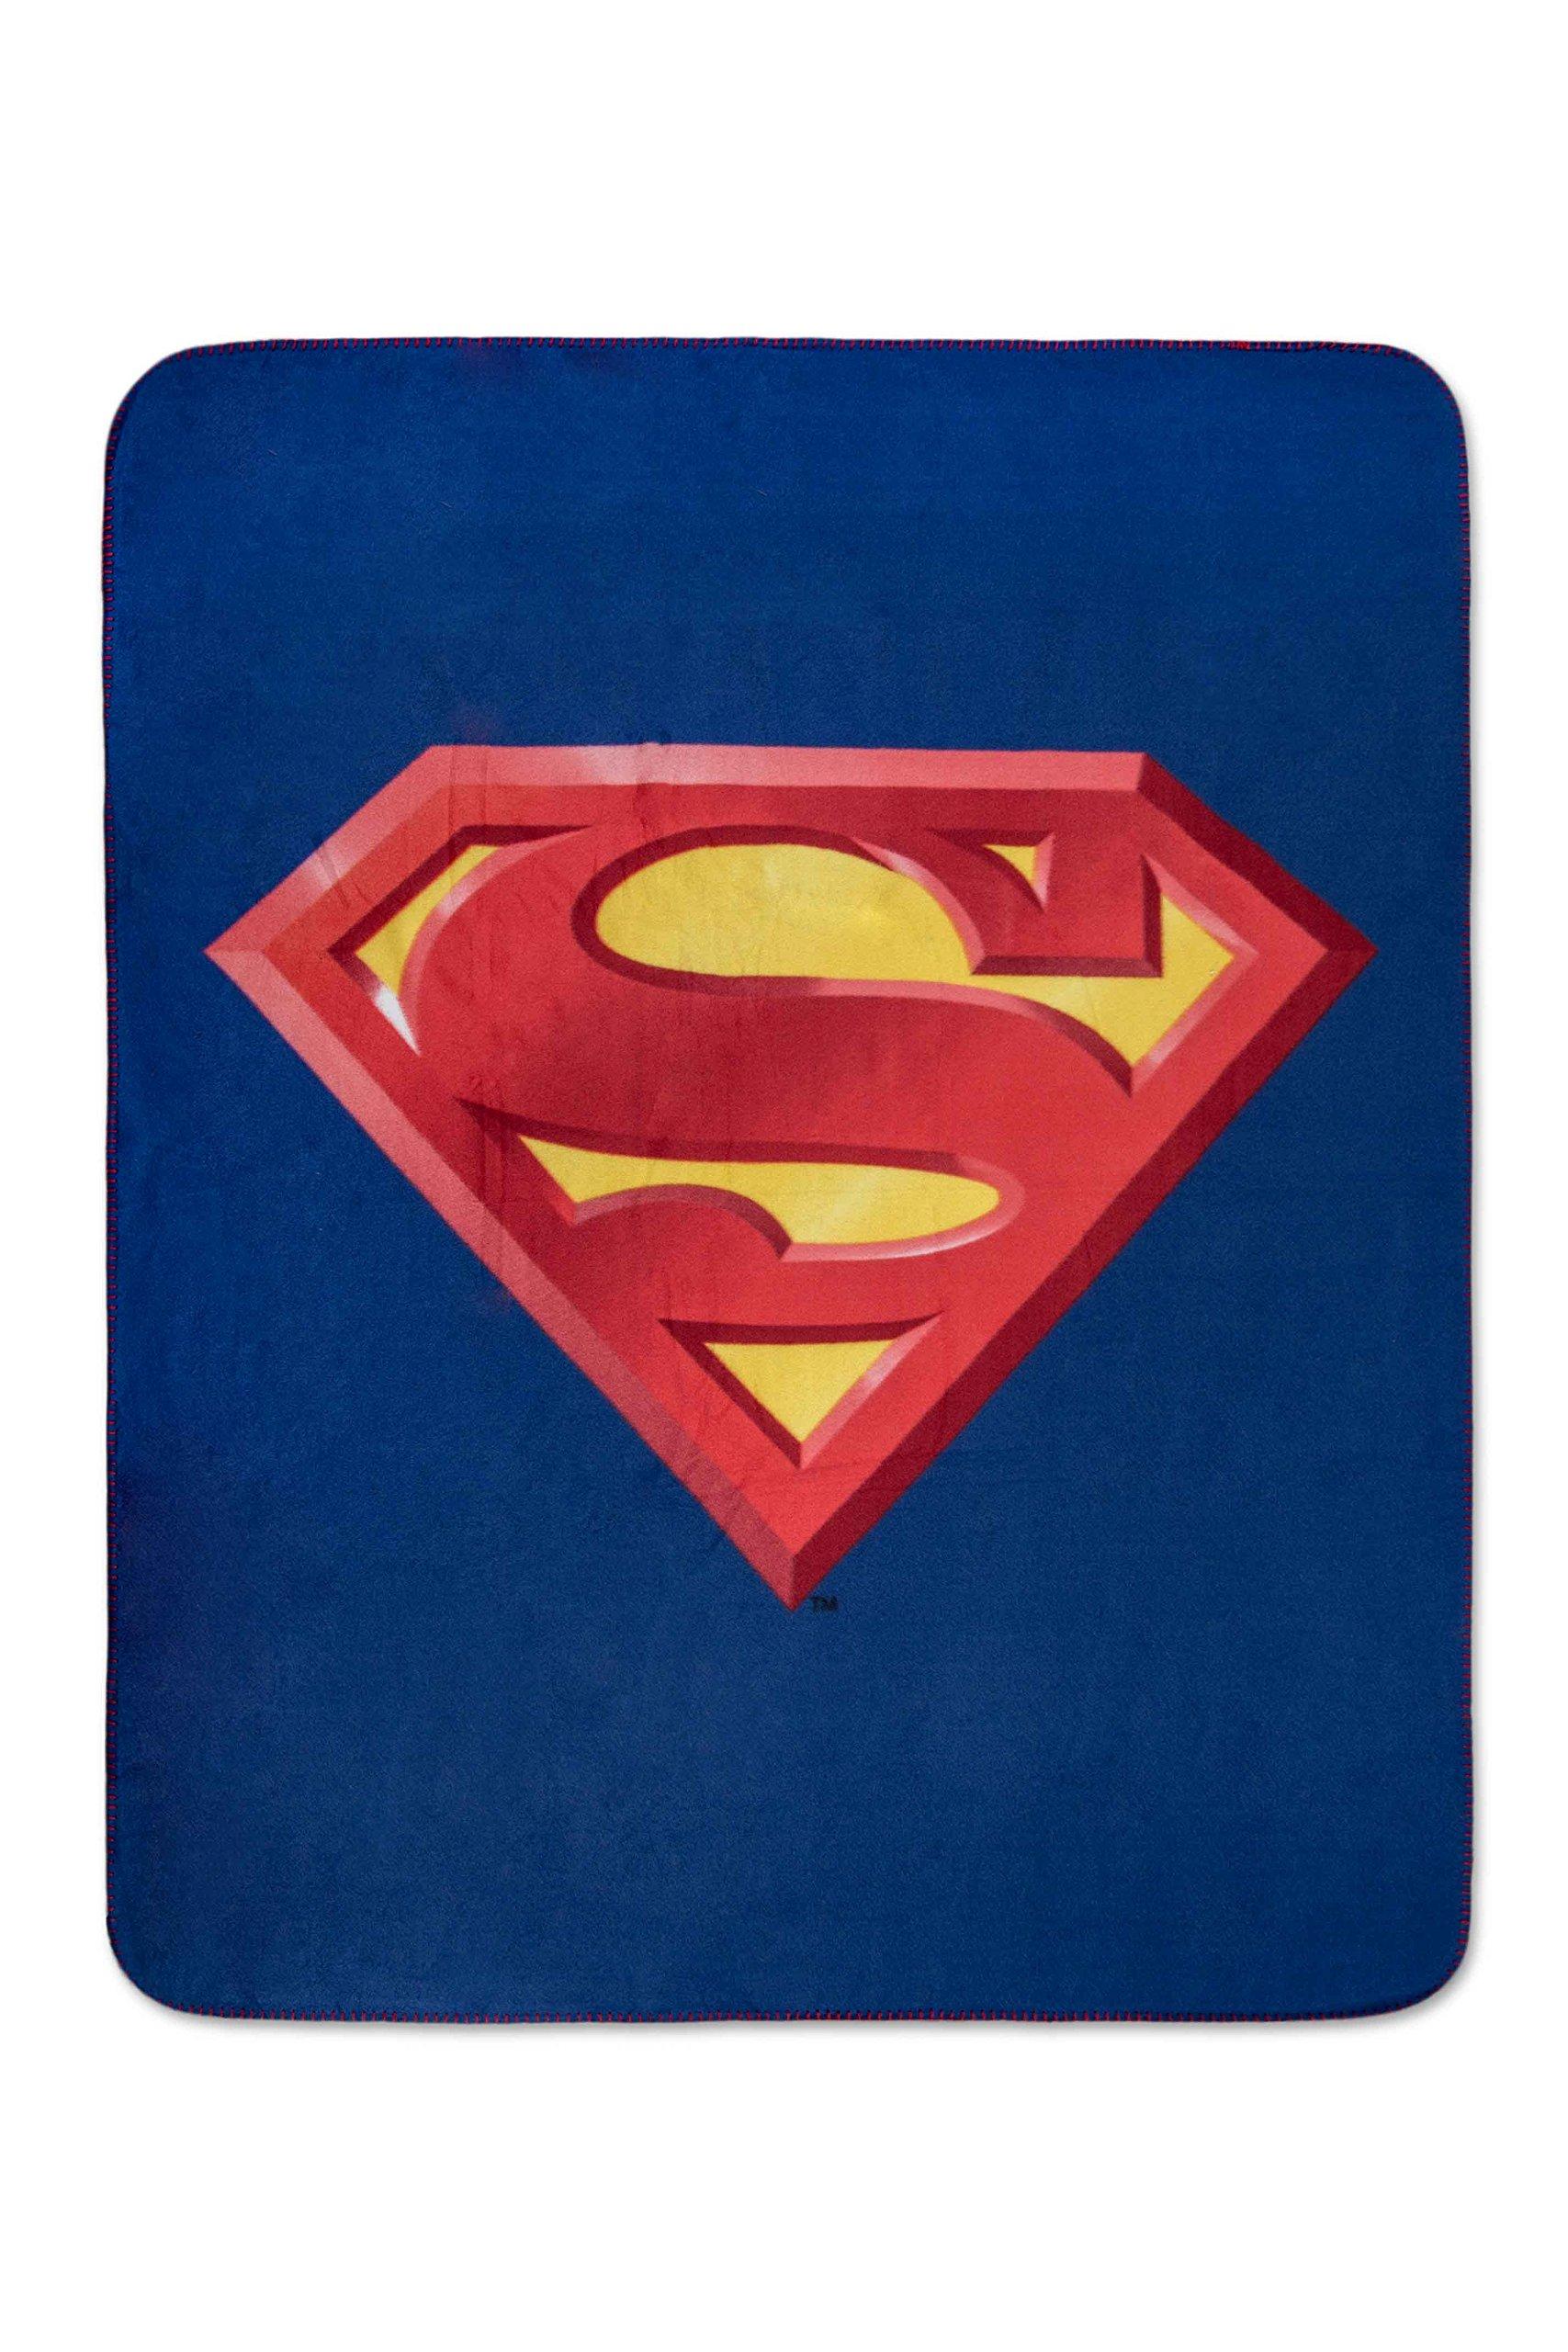 Superman Emblem Luxury Fleece Throw Blanket with Sewn edge Super Soft 50'' x 60'' 100% Polyester Fiber